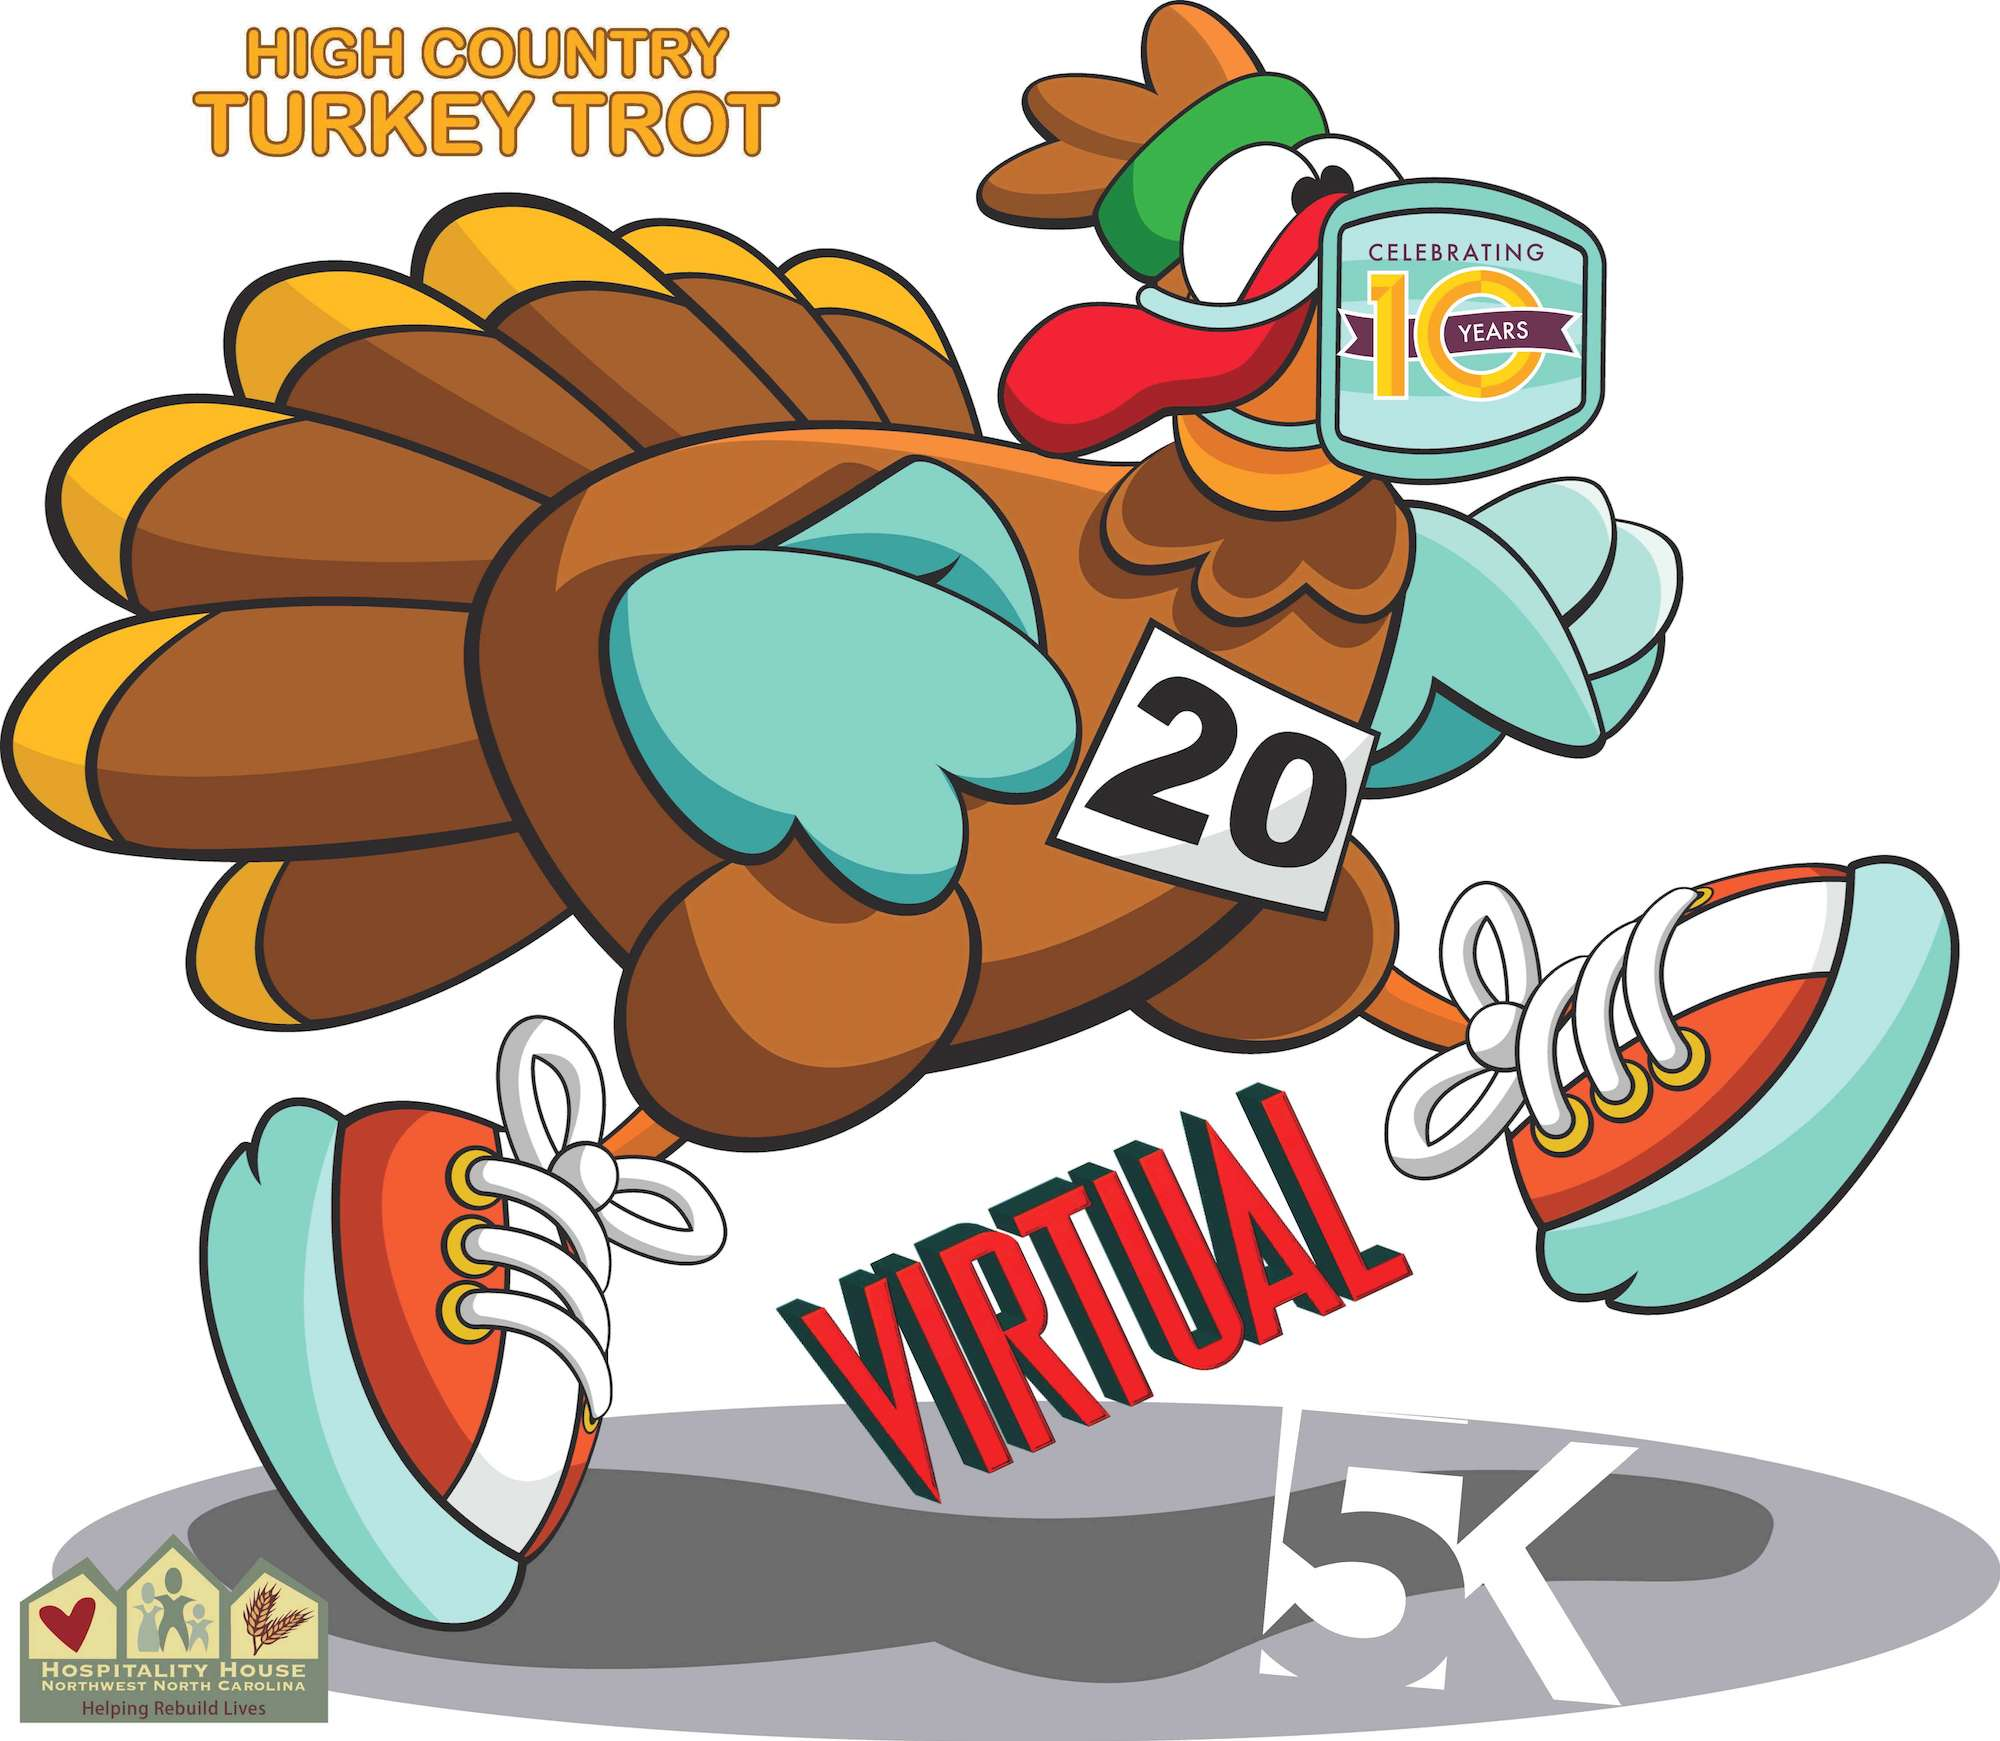 High Country Turkey Trot Week Nov. 19 - 26